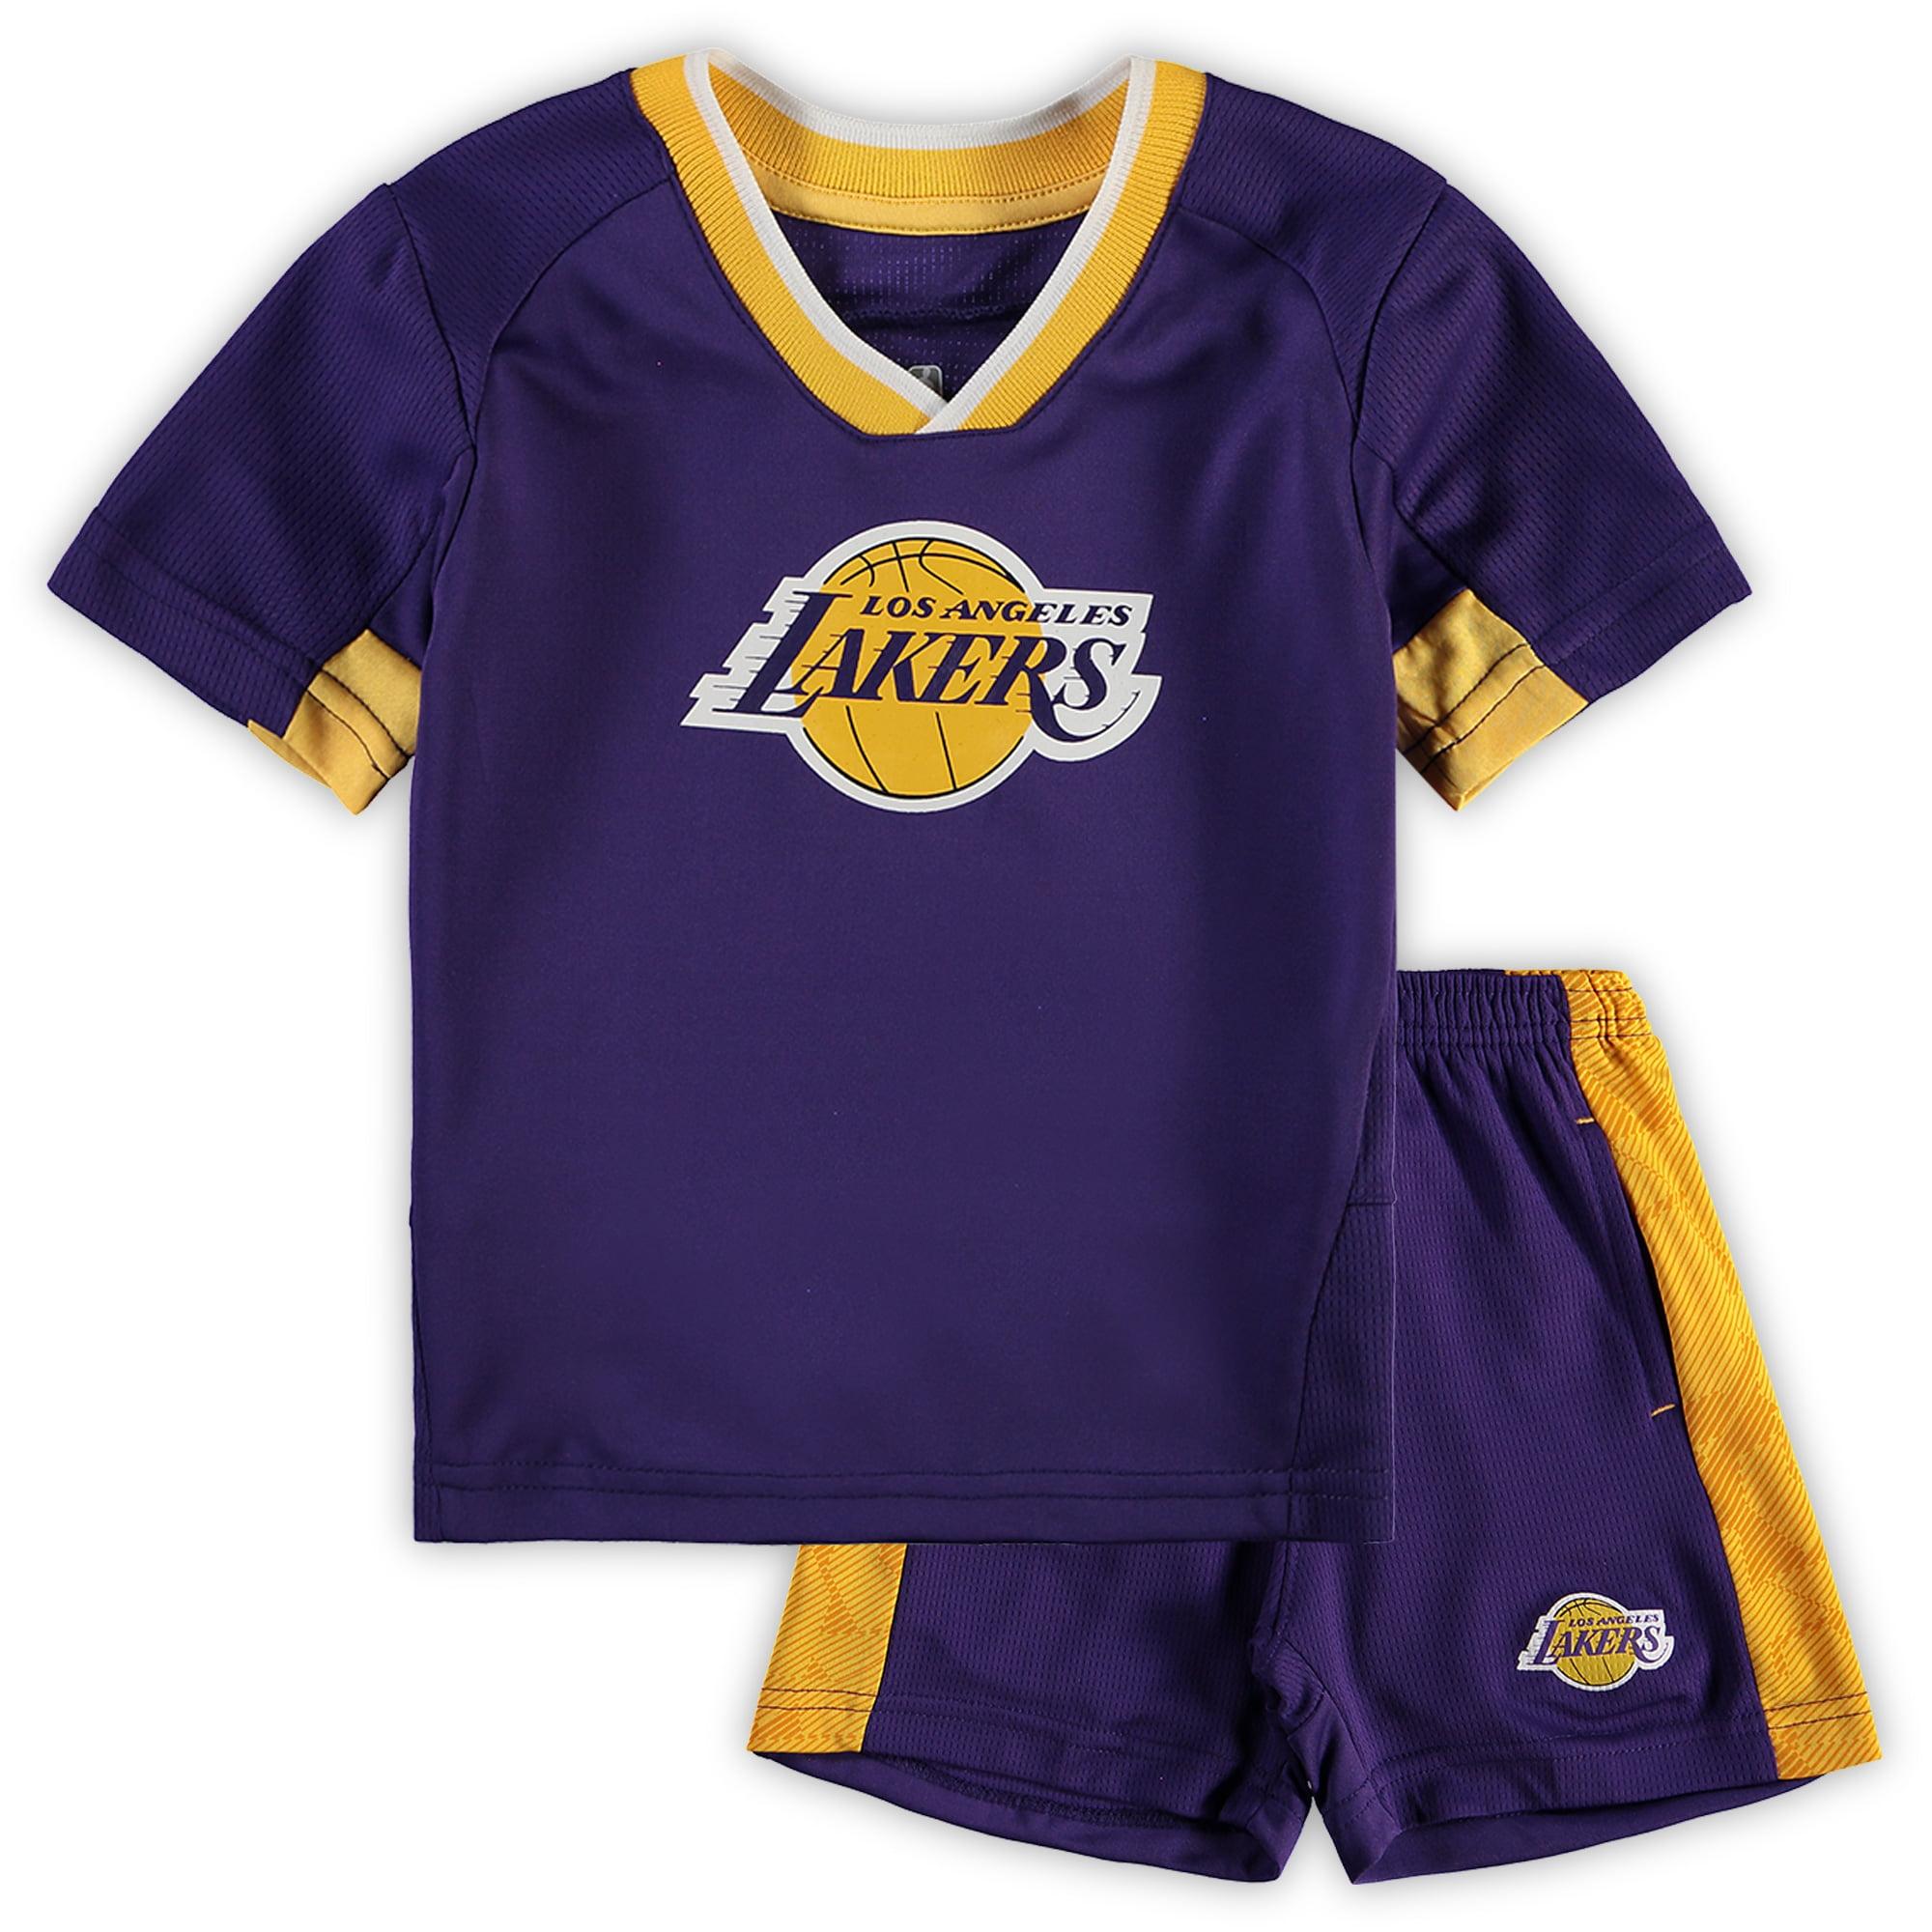 Los Angeles Lakers Preschool & Toddler Double Dribble T-Shirt & Shorts Set - Purple